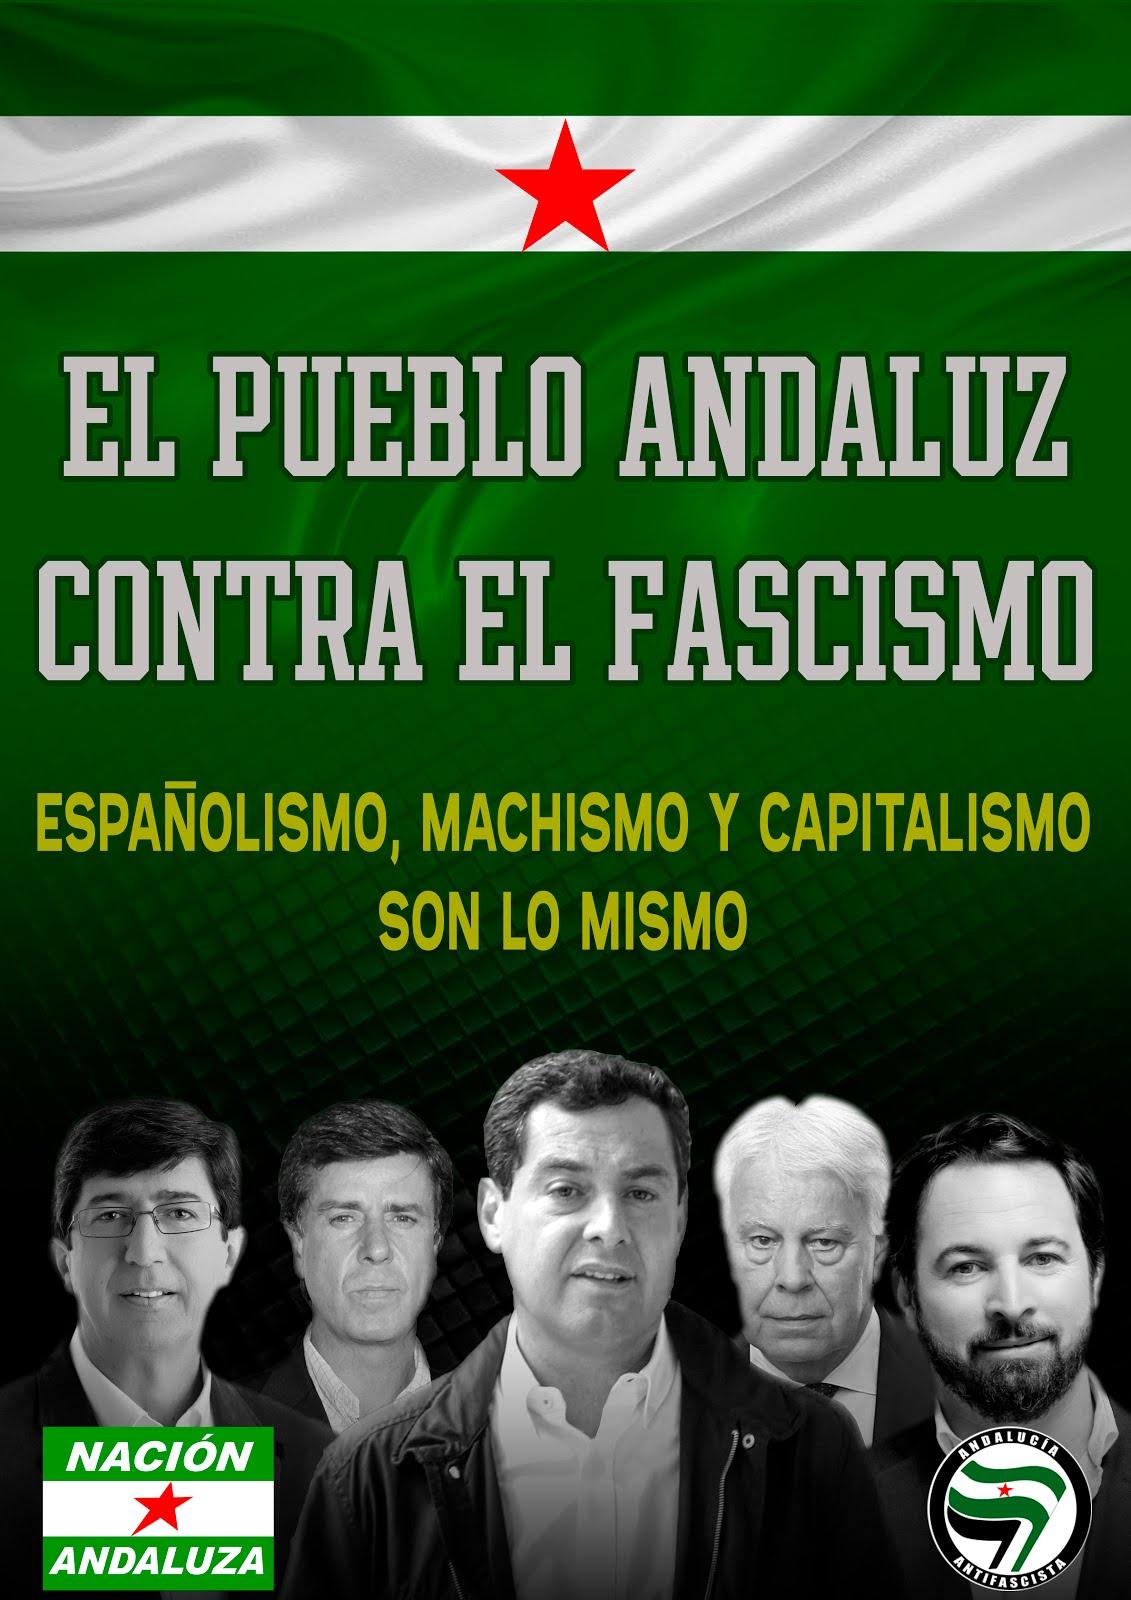 ¡Andalucía antifascista!